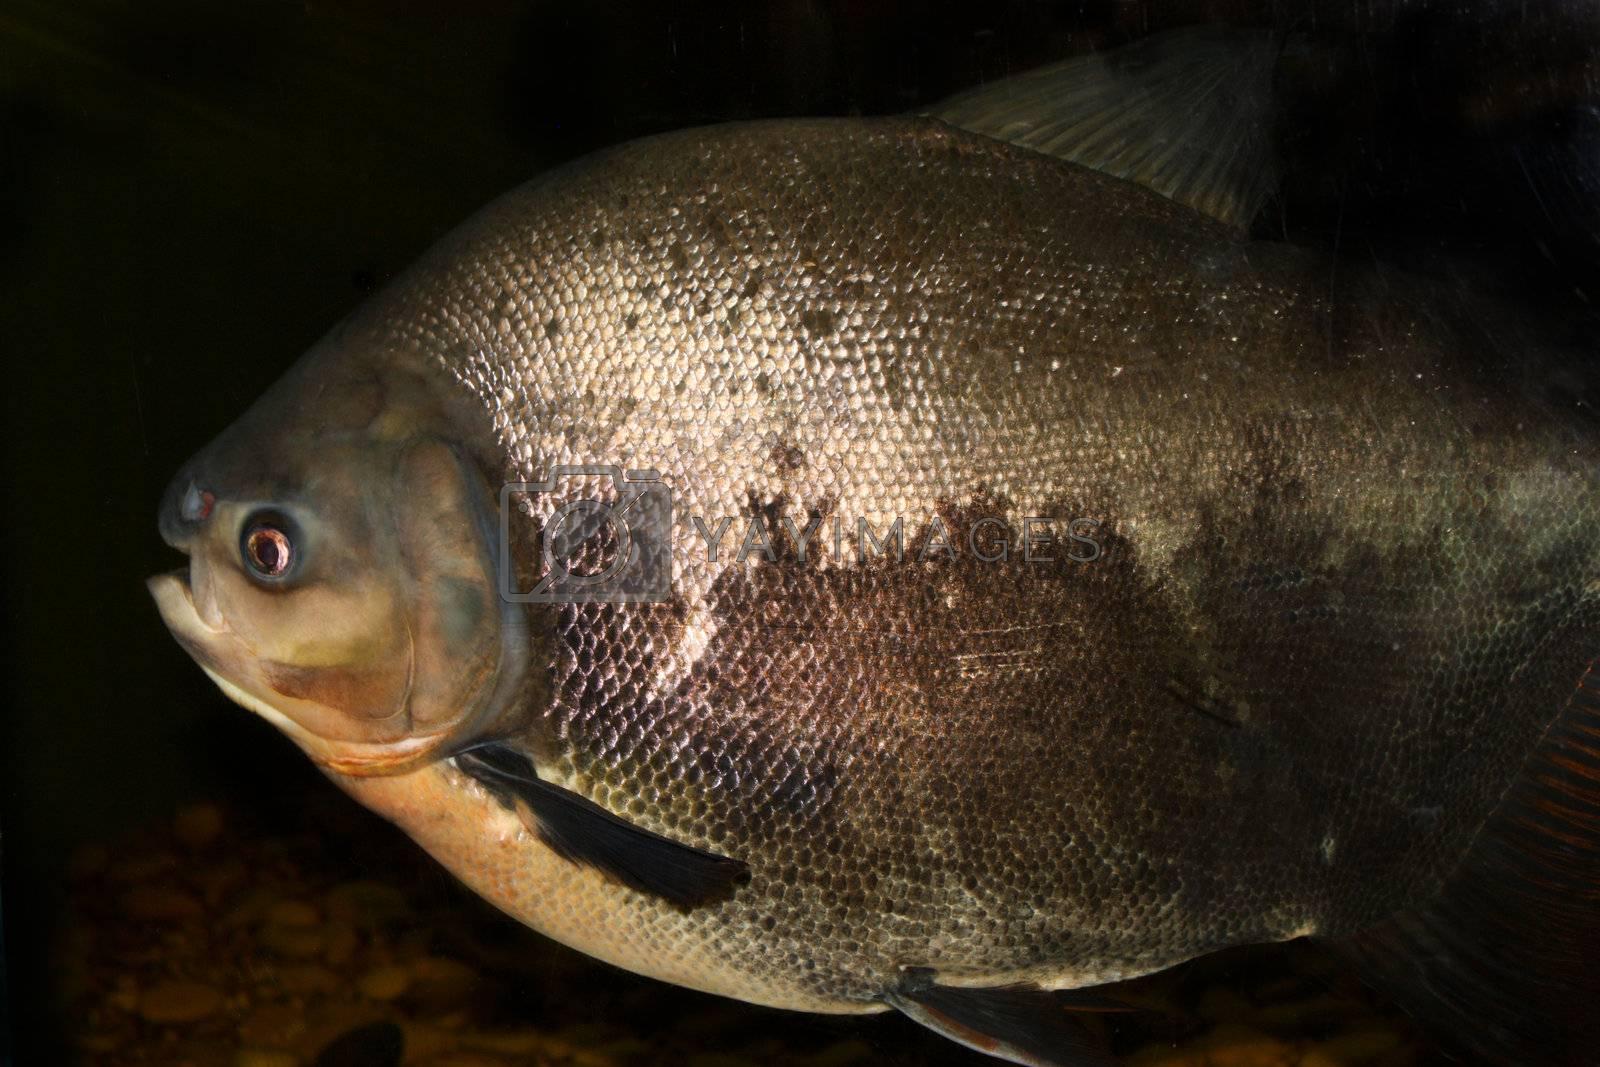 Royalty free image of fish by Lyudmila